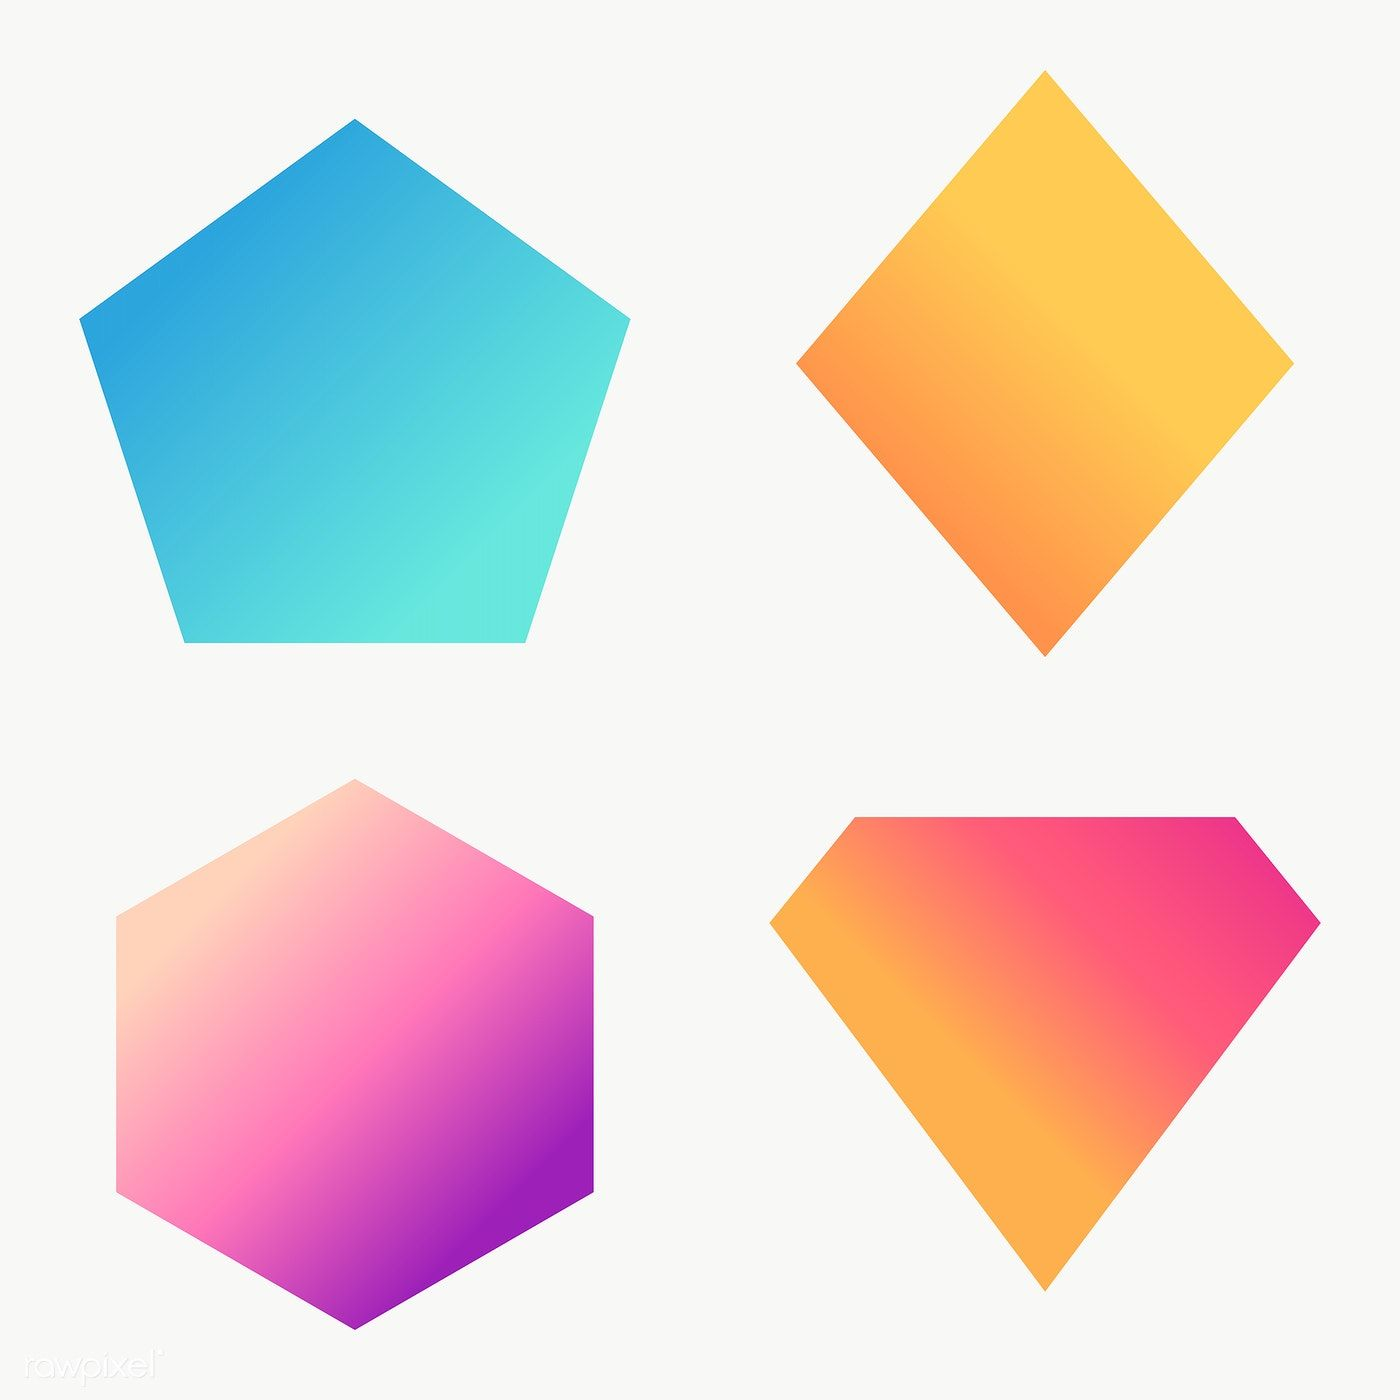 Colorful Gradient Geometric Shapes Set Transparent Png Free Image By Rawpixel Com Ningzk V Geometric Shapes Printable Designs Geometric